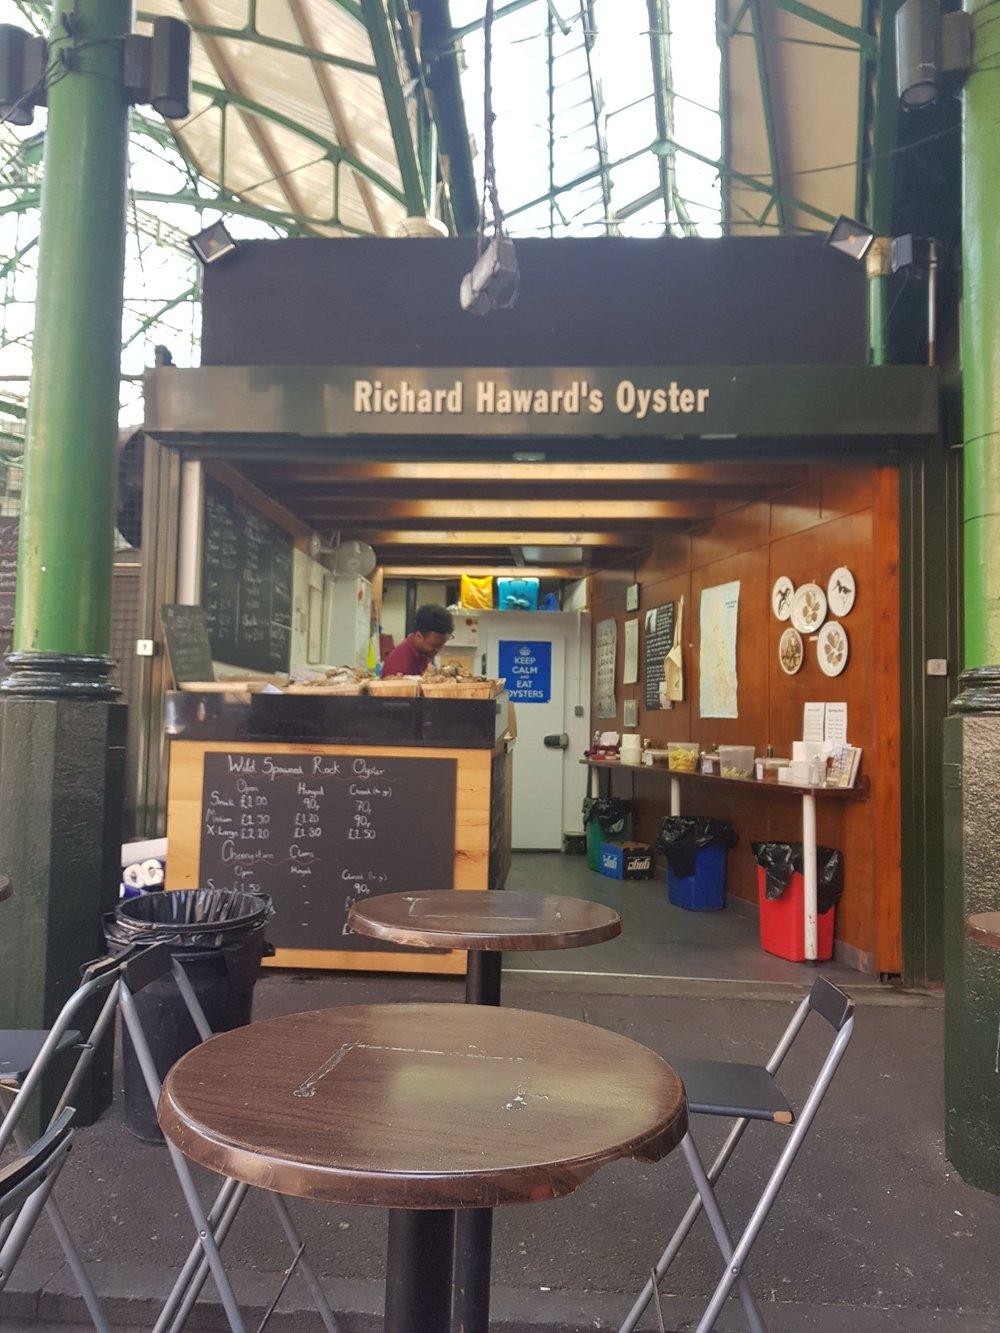 Richard Haward's Oyster.